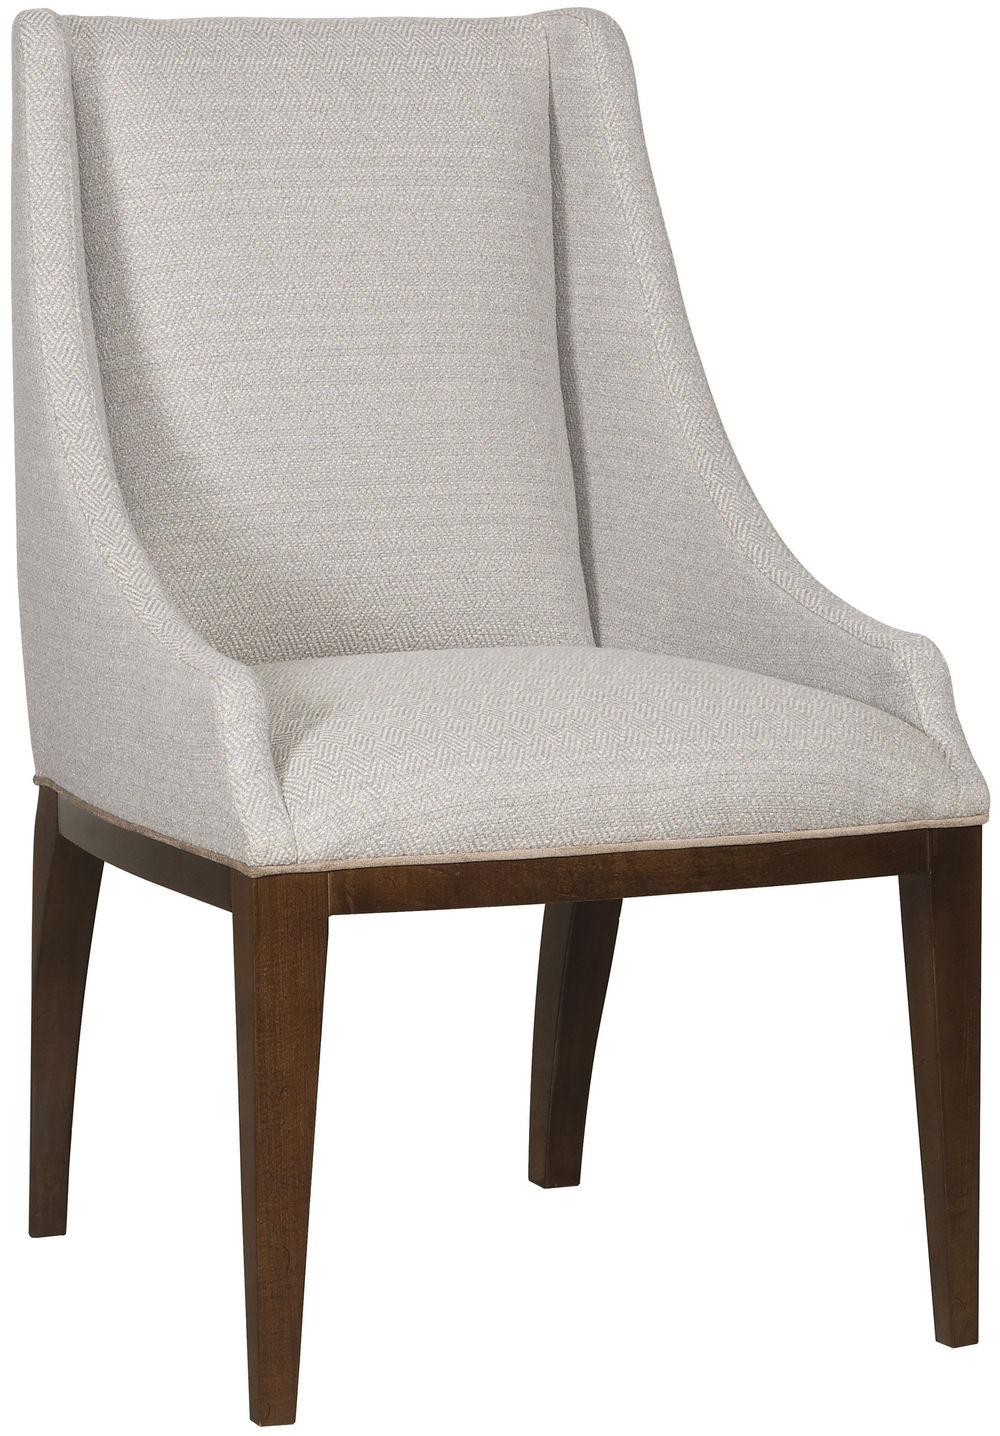 Vanguard Furniture - Ithaca Dining Arm Chair